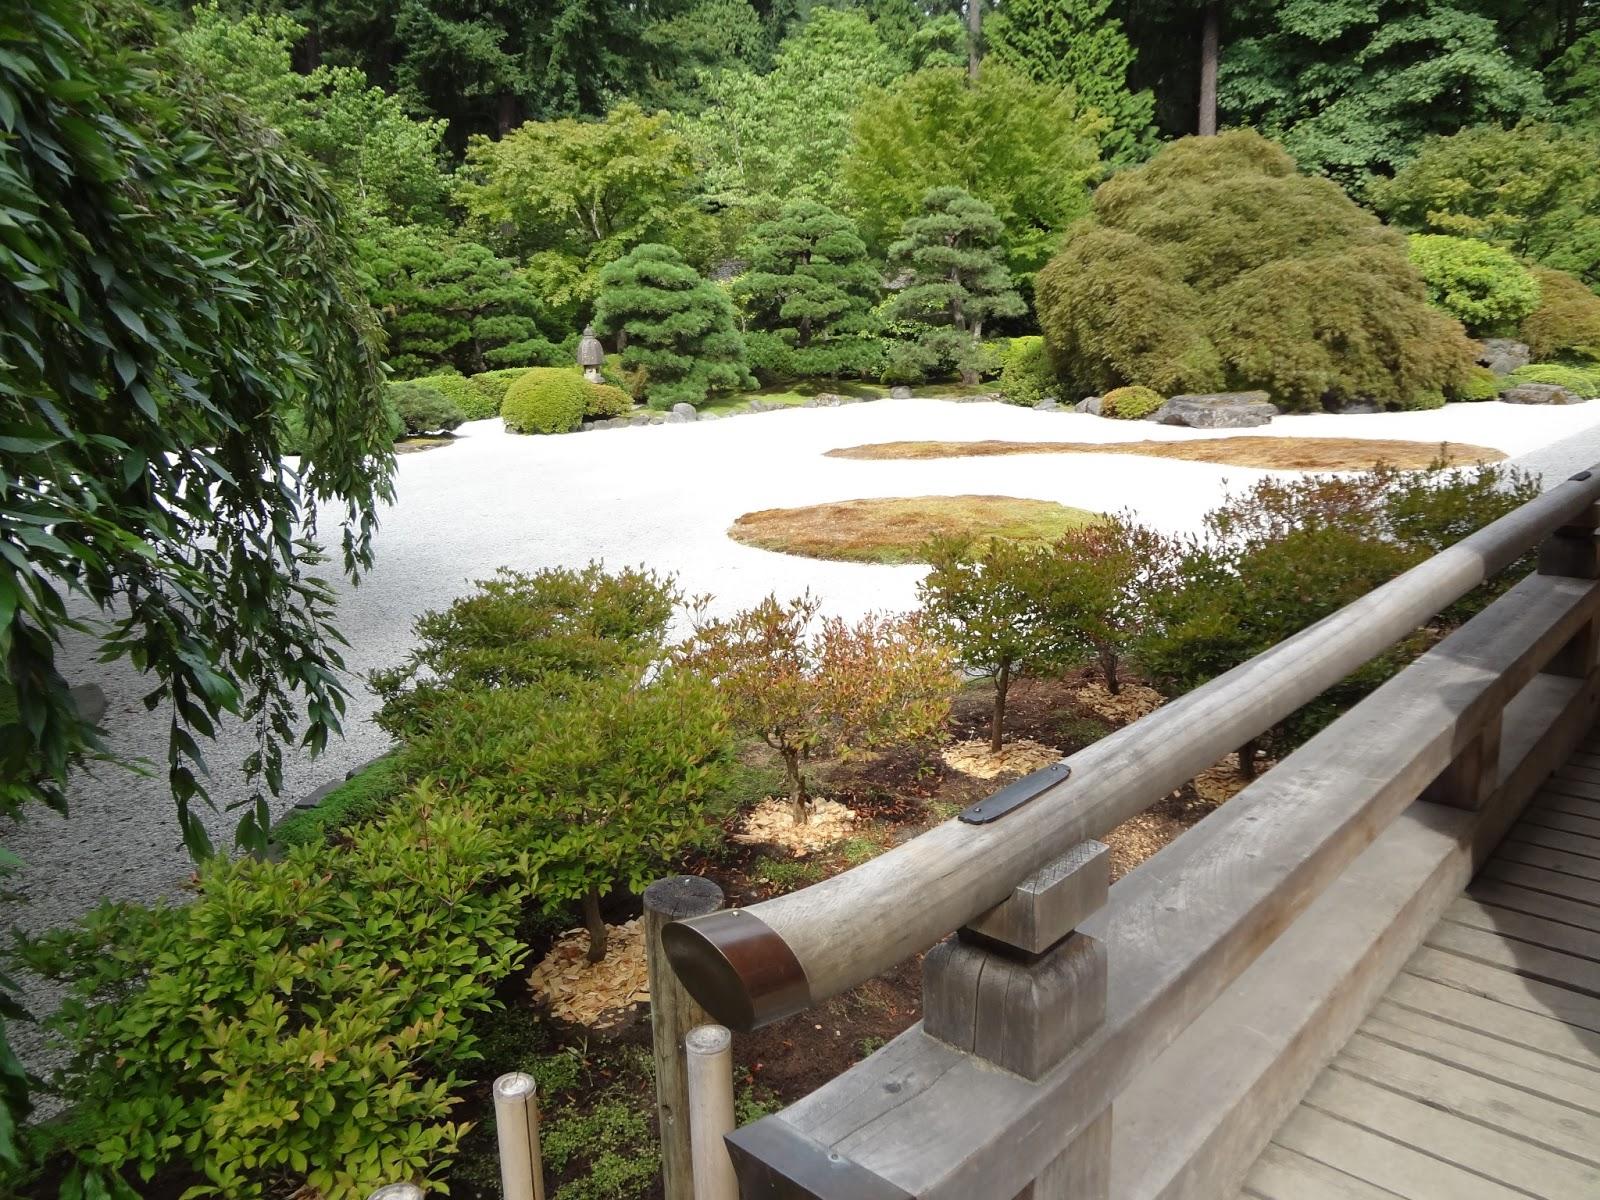 Field Trips With Mr Skinks Portland Japanese Gardens Washington Park Playground